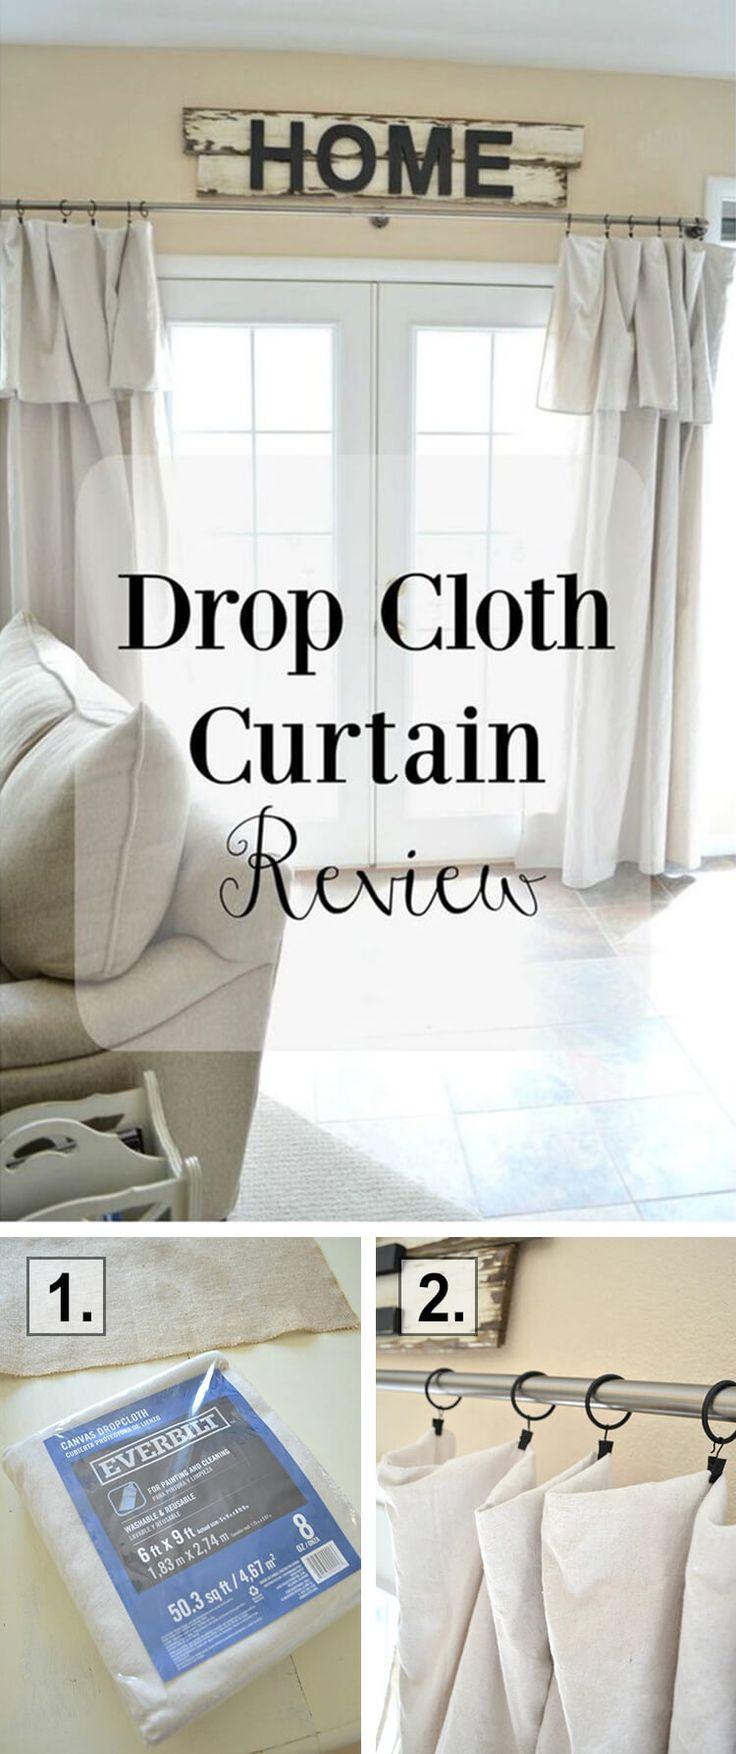 Custom Drapes from Drop Cloths